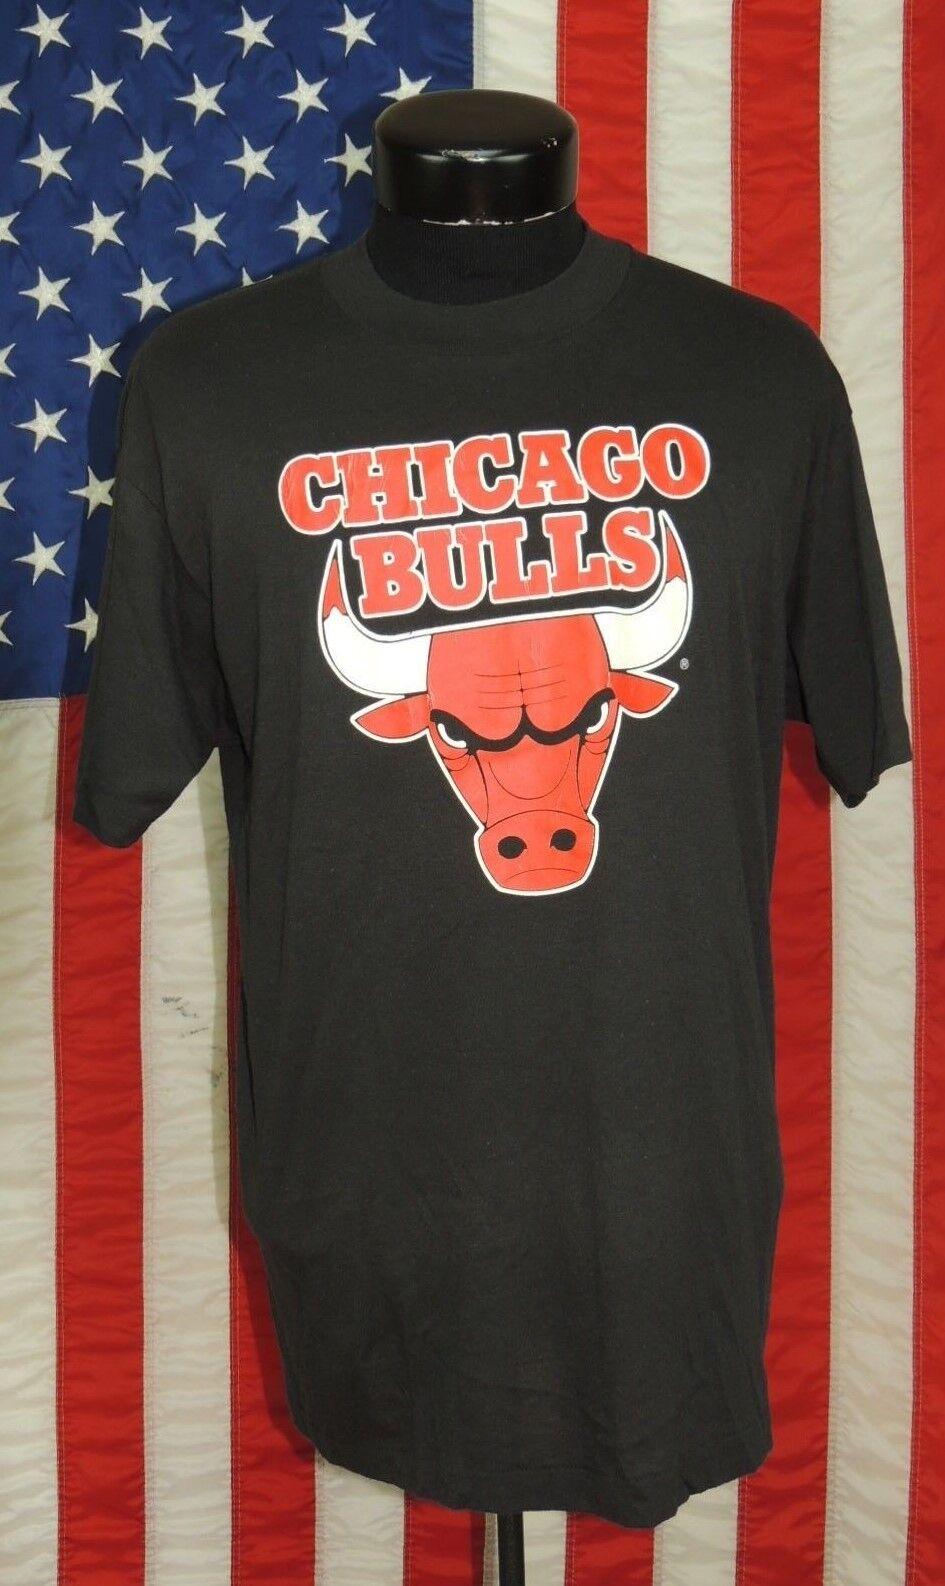 5d63eec6cfae3f Rare VTG Made USA Trench Buffalo NY Chicago Bulls XL NBA Basketball T Tee  Shirt